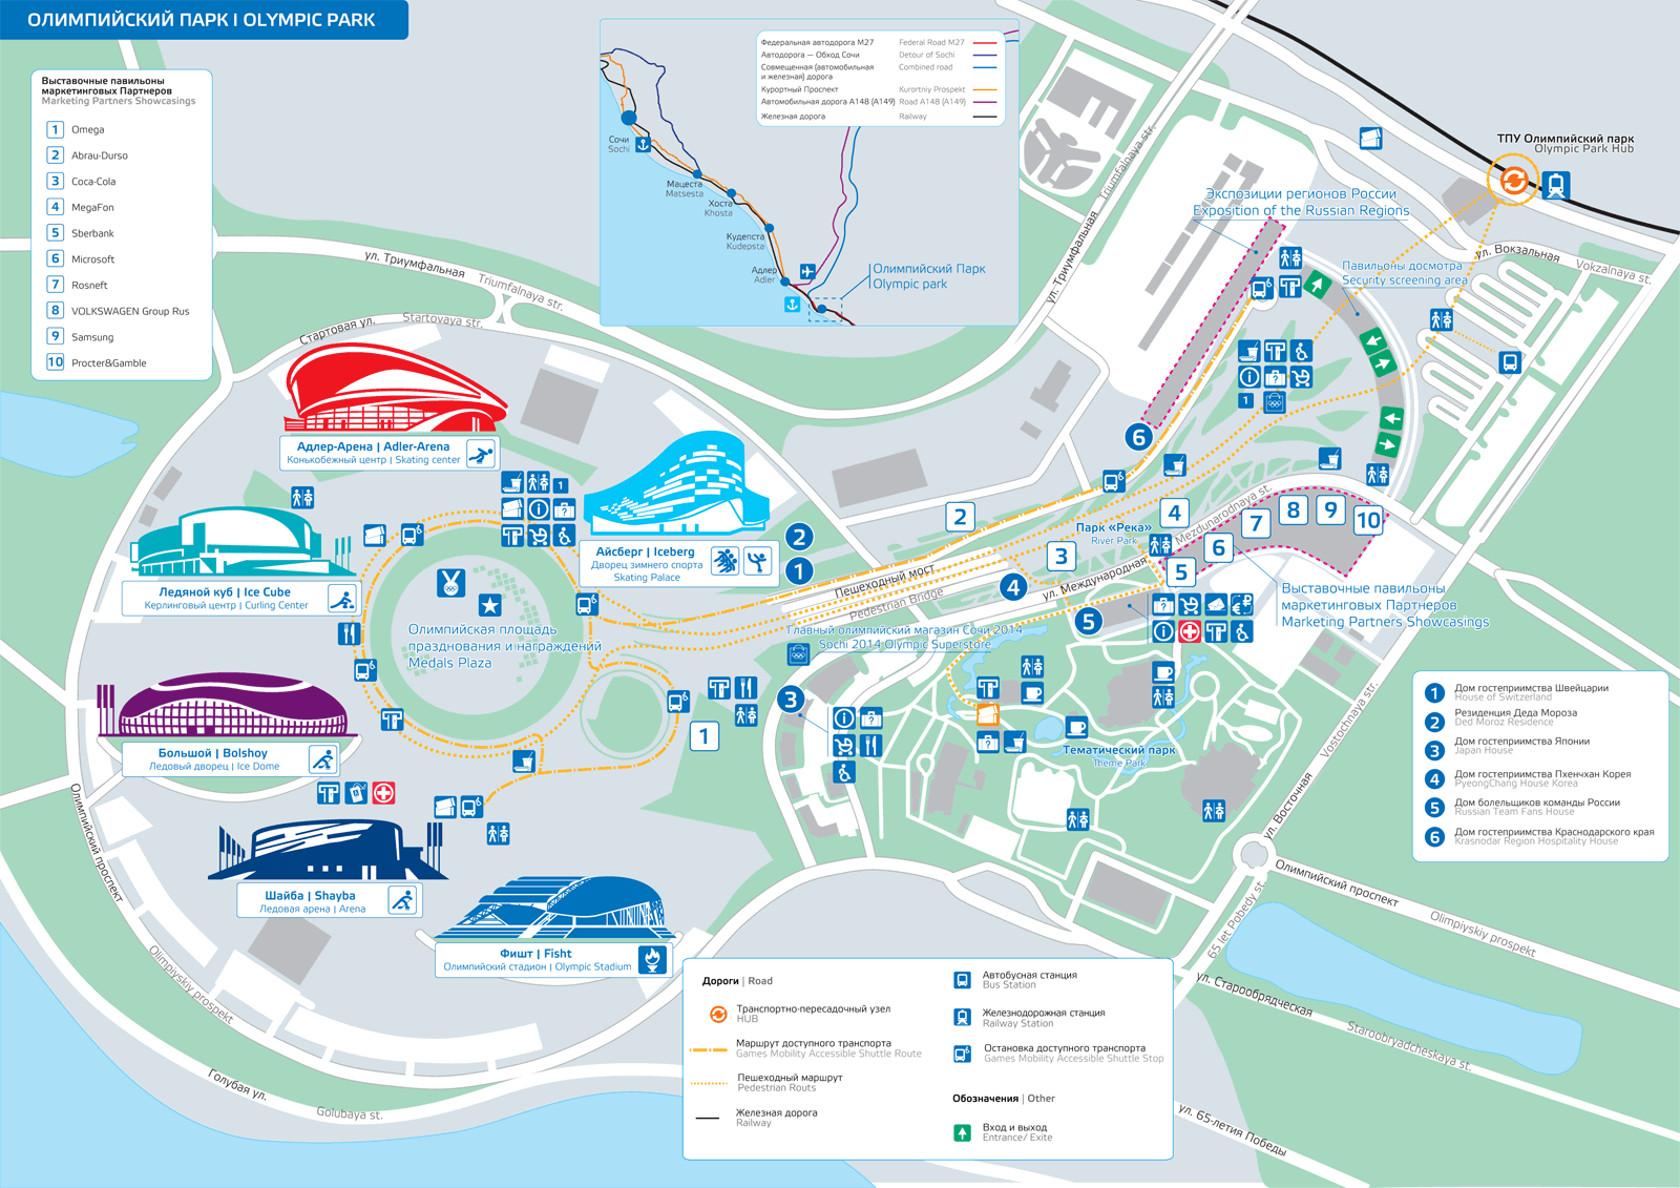 Олимпийский парк (Сочи) / Olympic Park (Sochi)